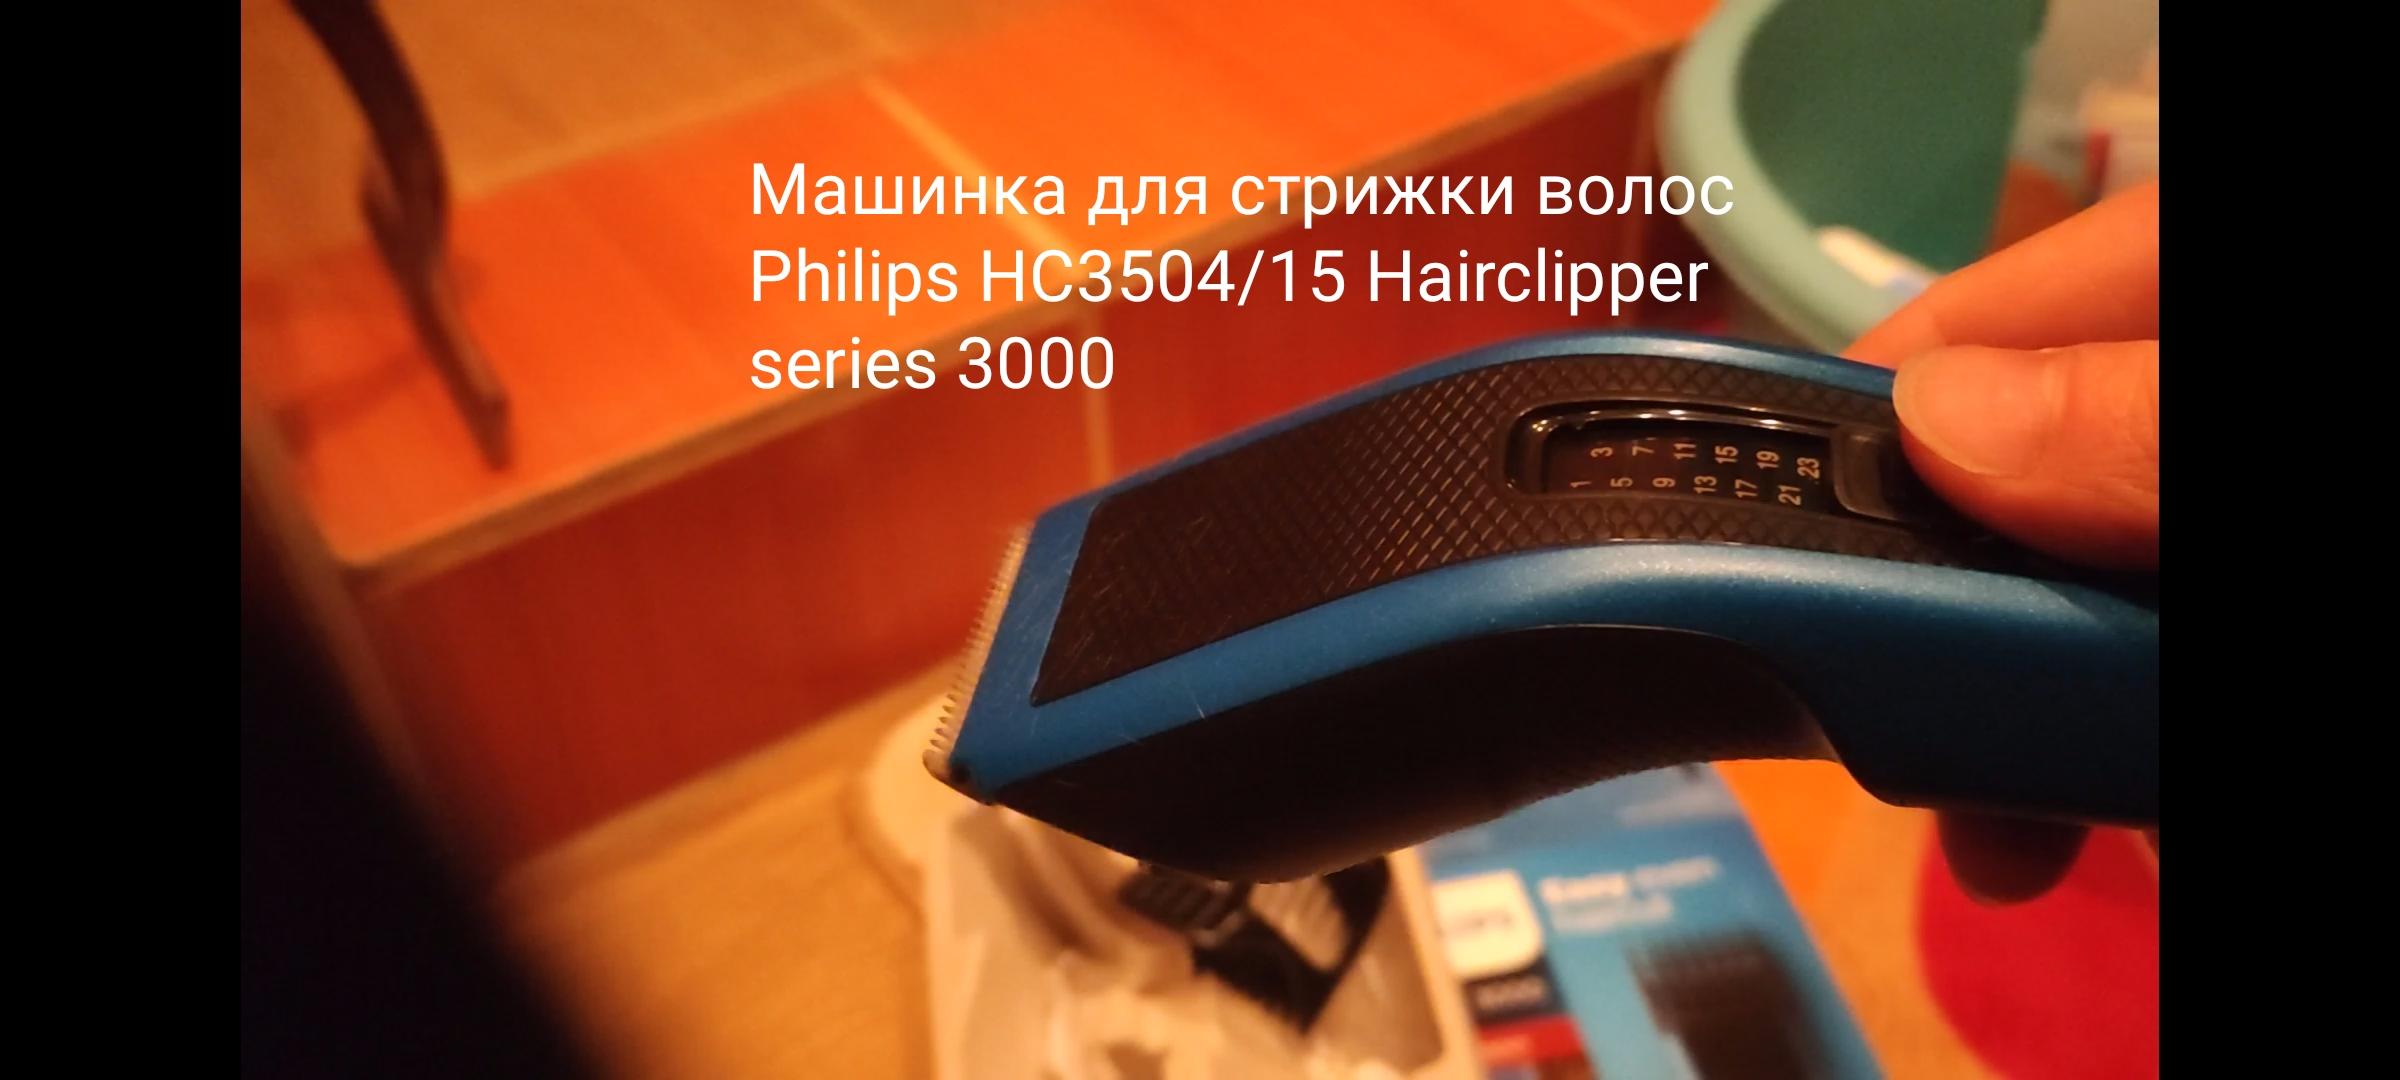 Обзор машинки для стрижки волос Philips HC3504/15 Hairclipper series 3000